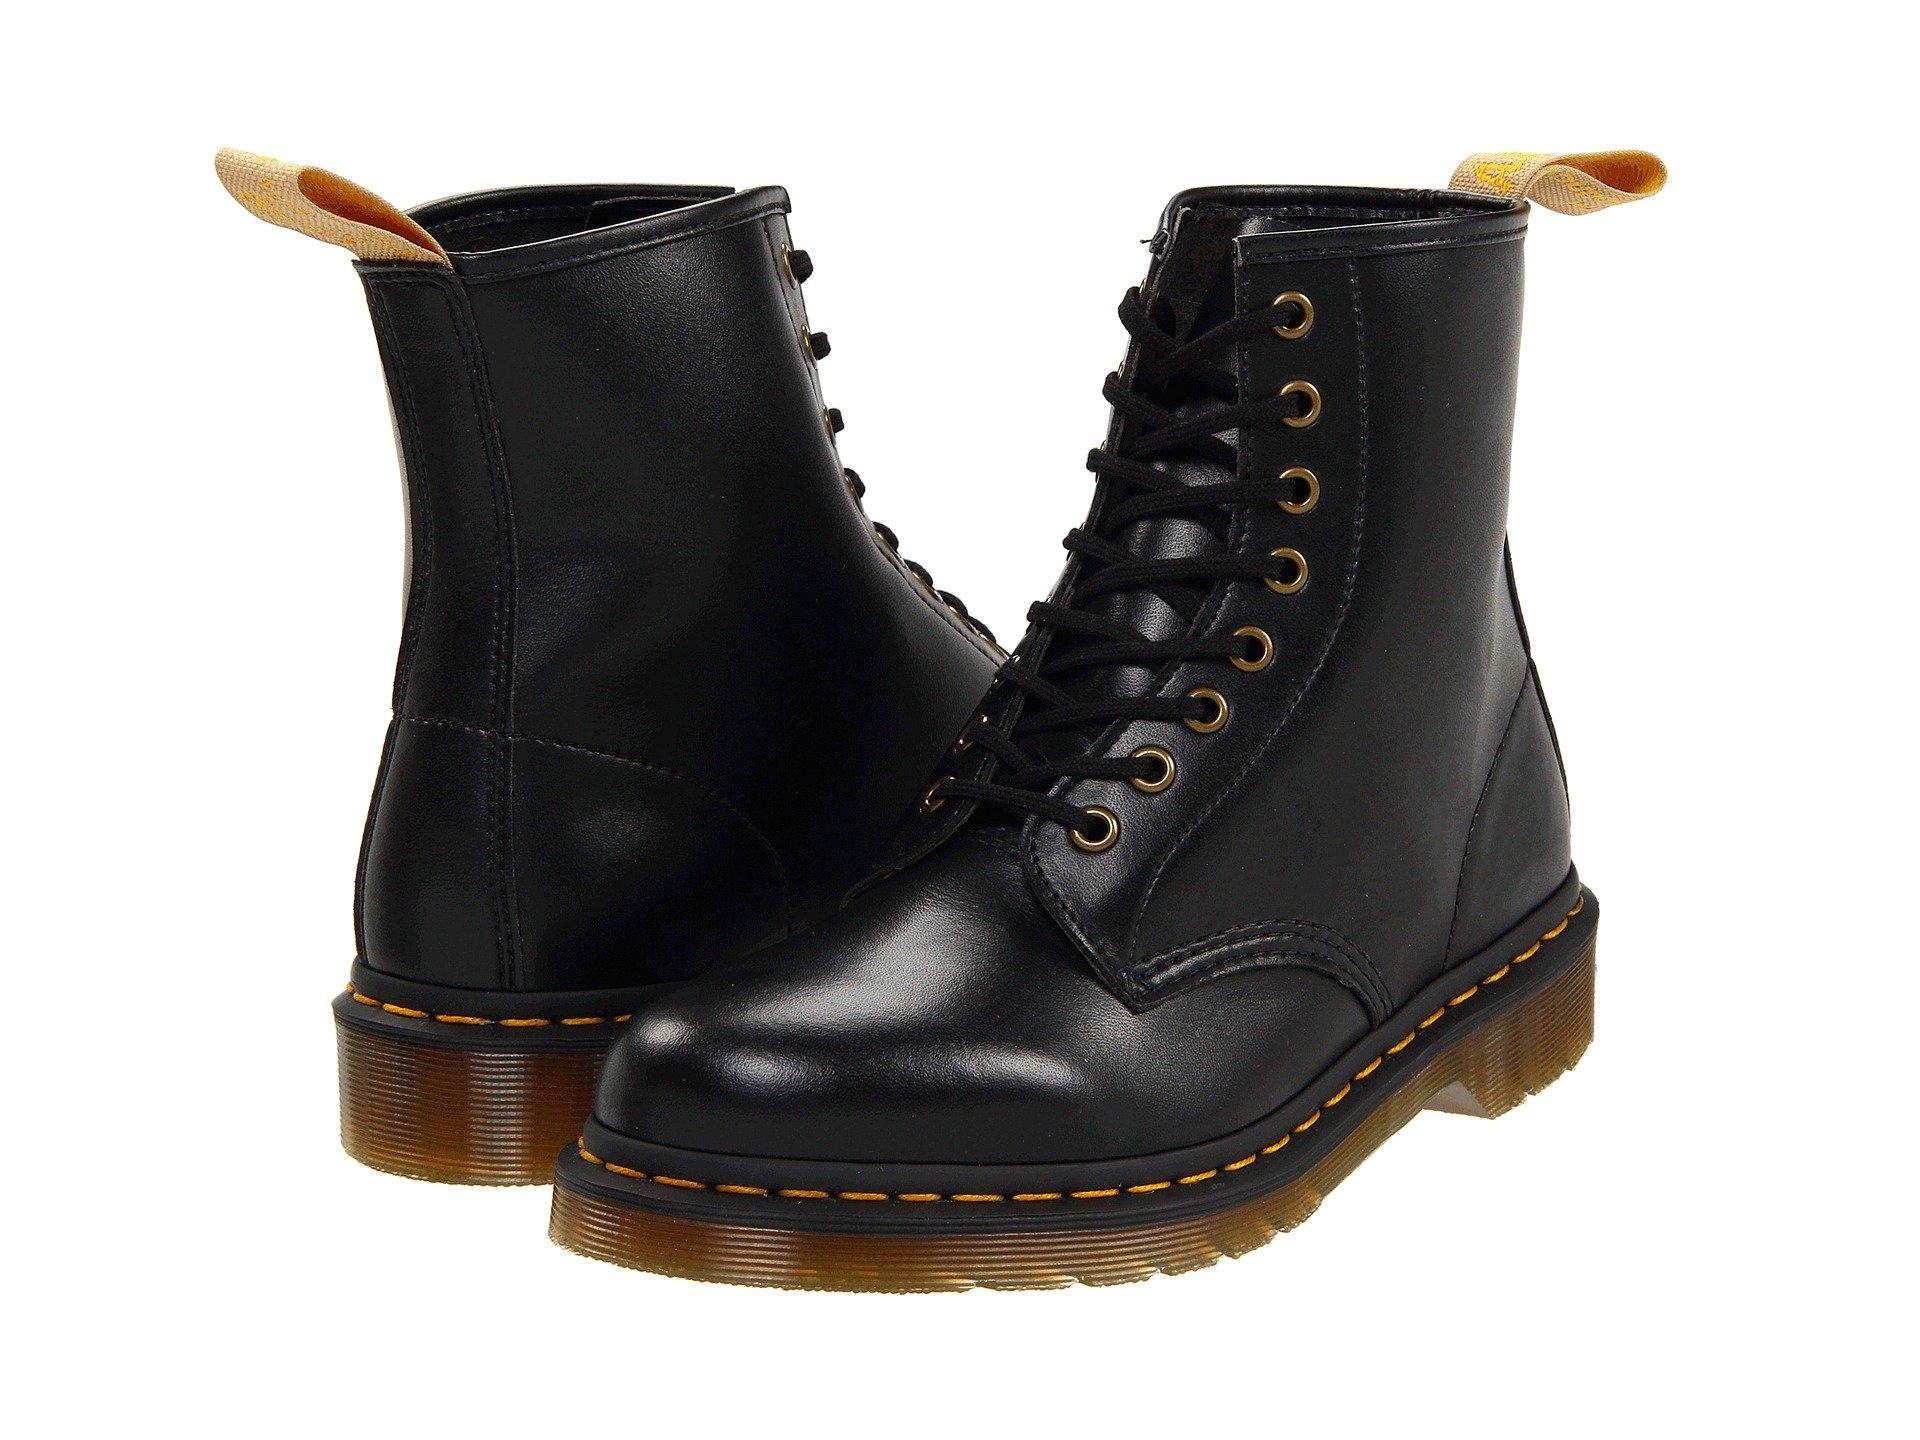 98094e007910 Men s Dr. Martens Shoes + FREE SHIPPING